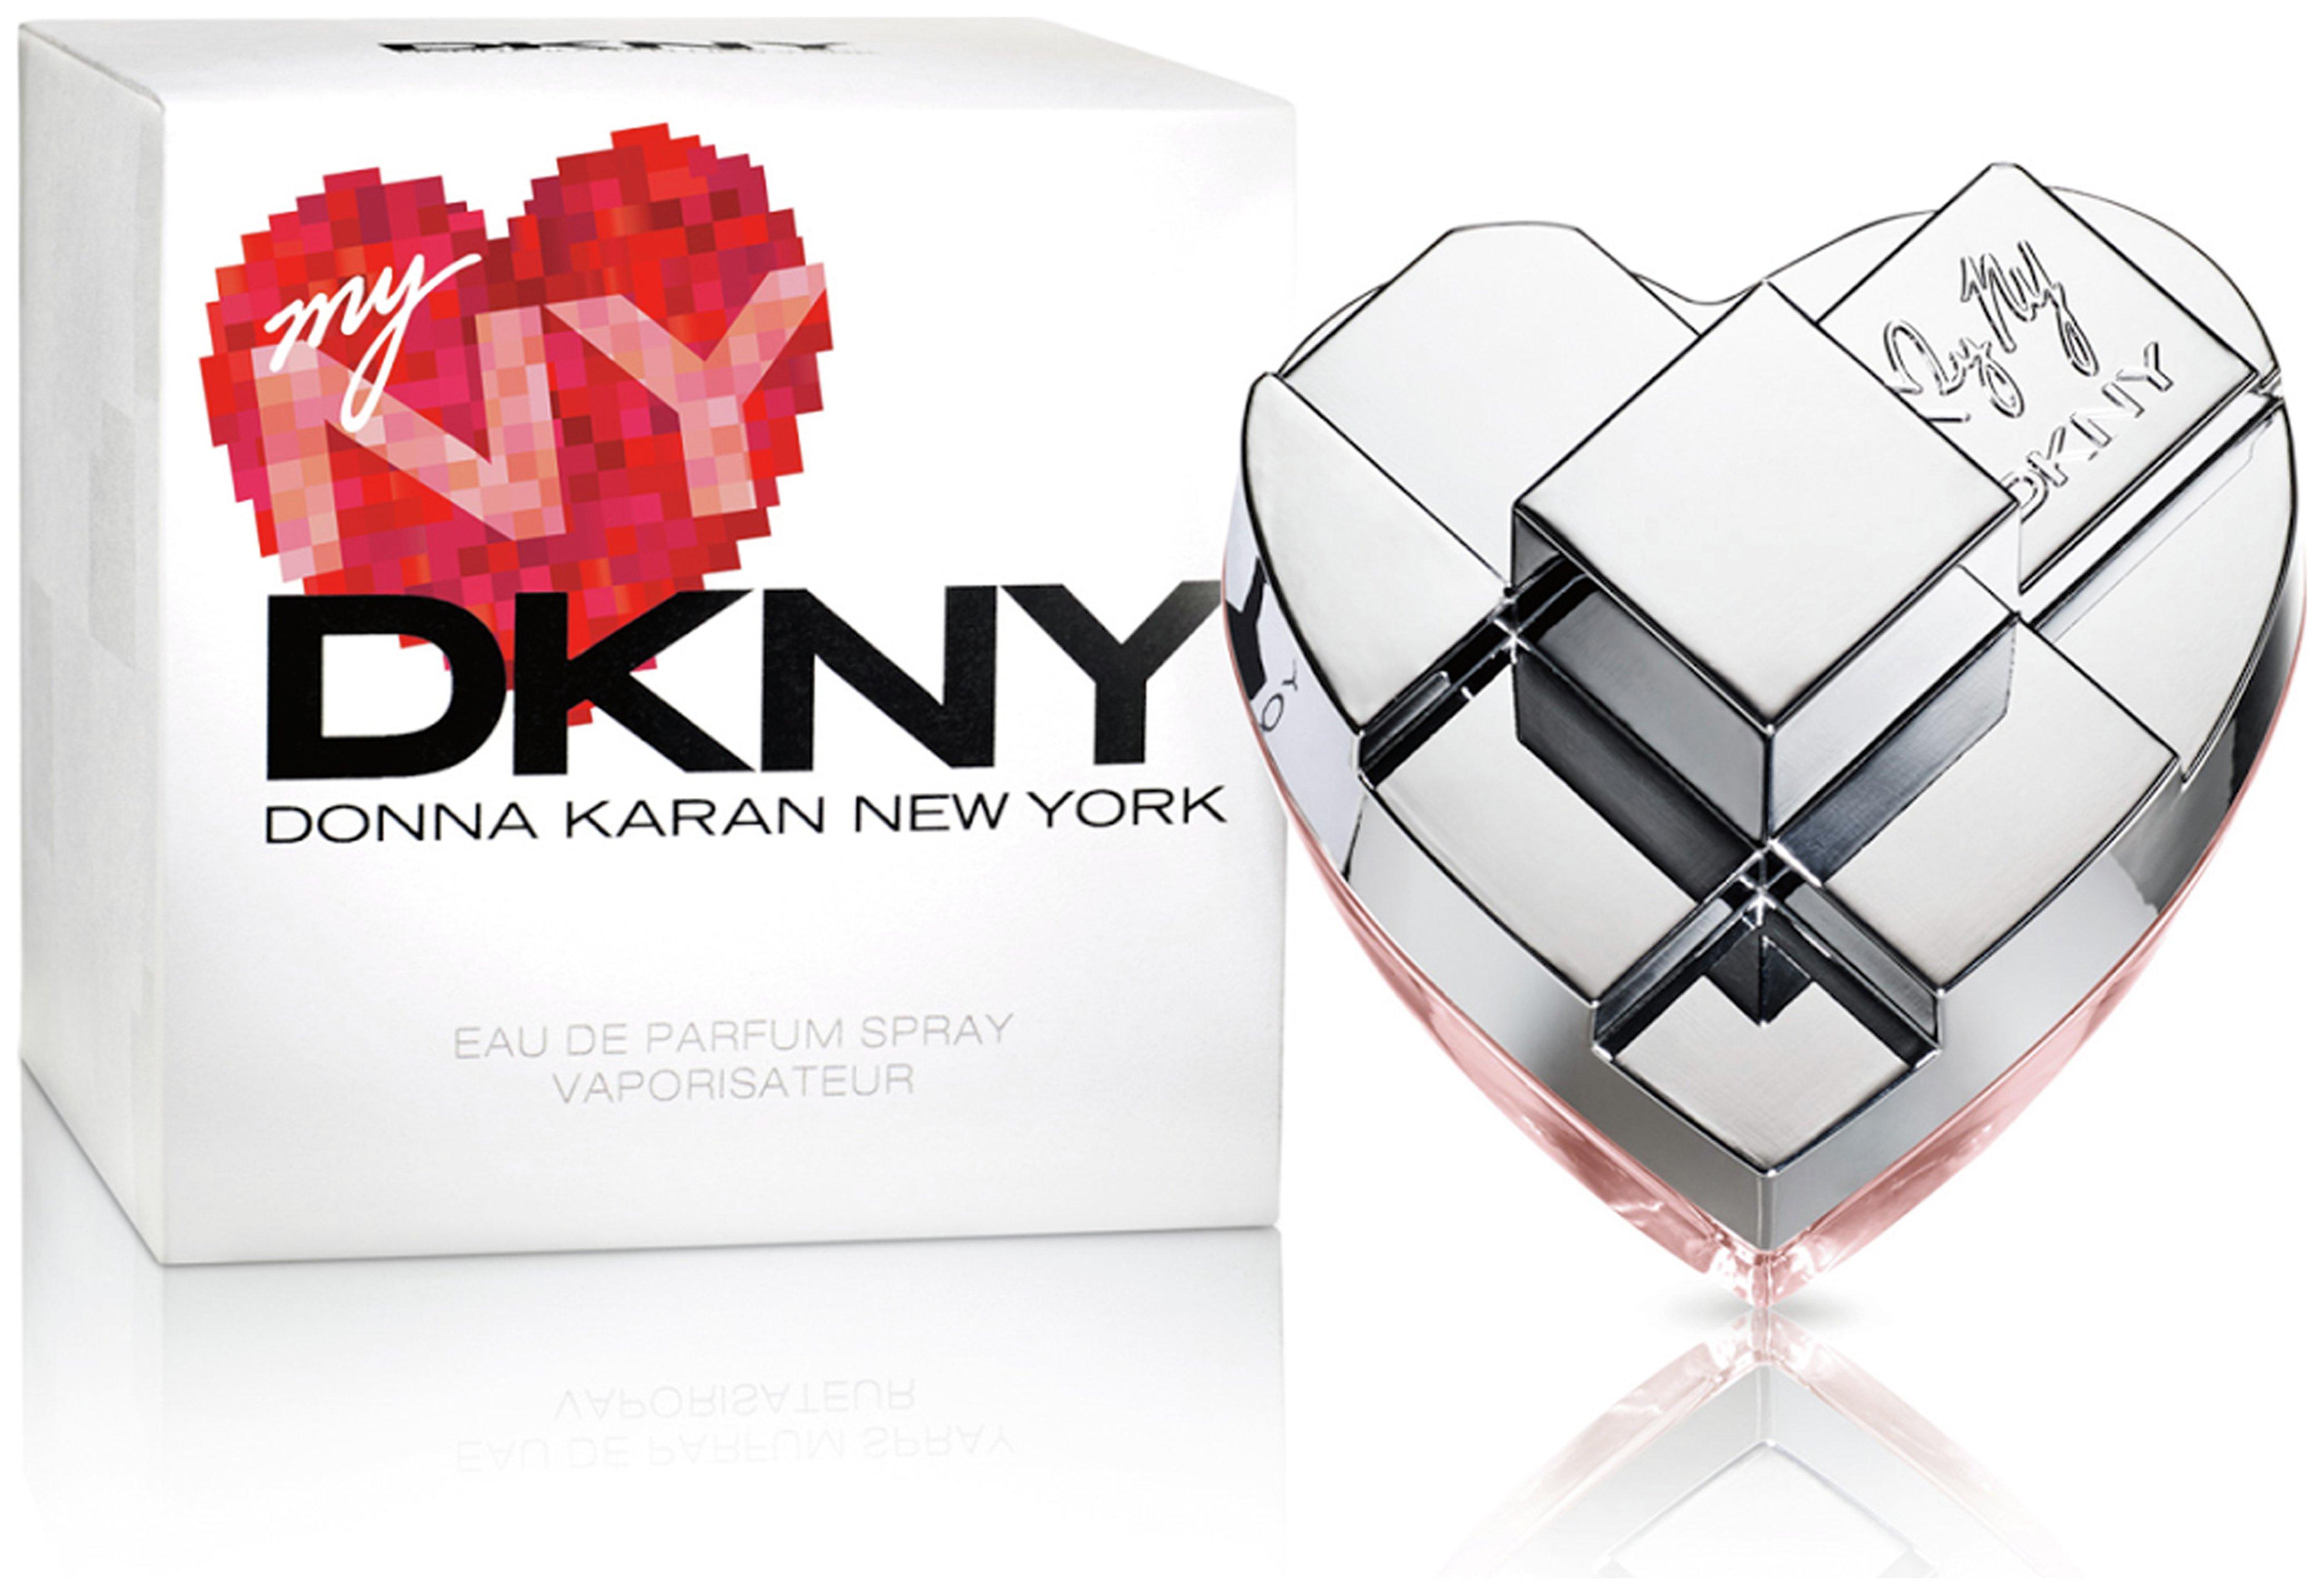 dkny-myny-eau-de-parfum-for-women-100ml